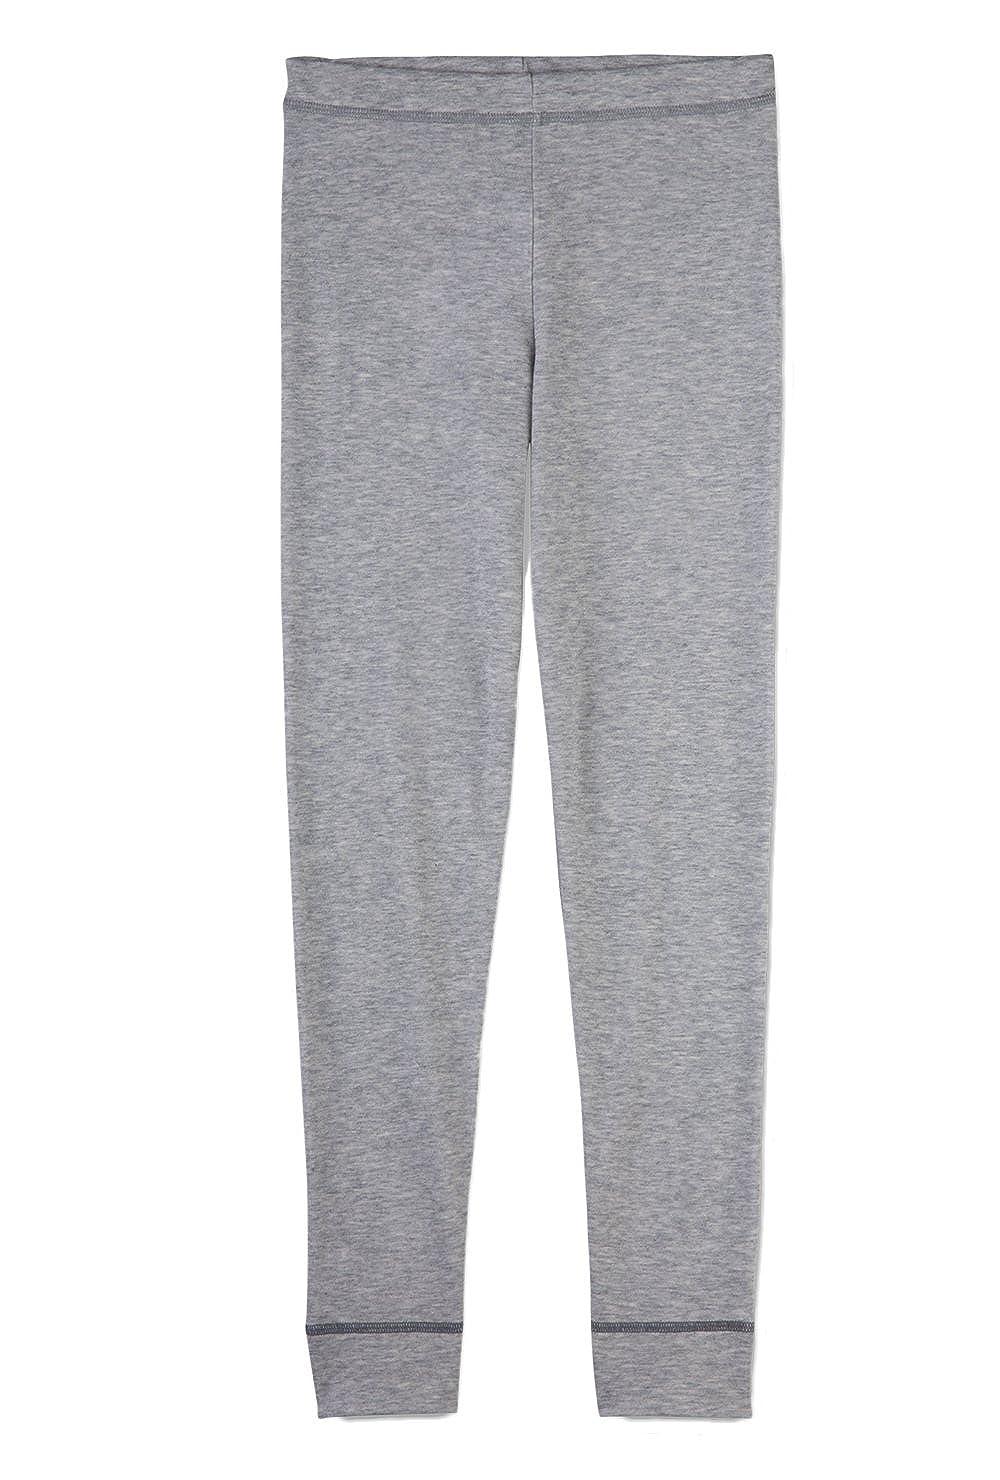 Sanetta Pantaloni Termici Bambina 344593